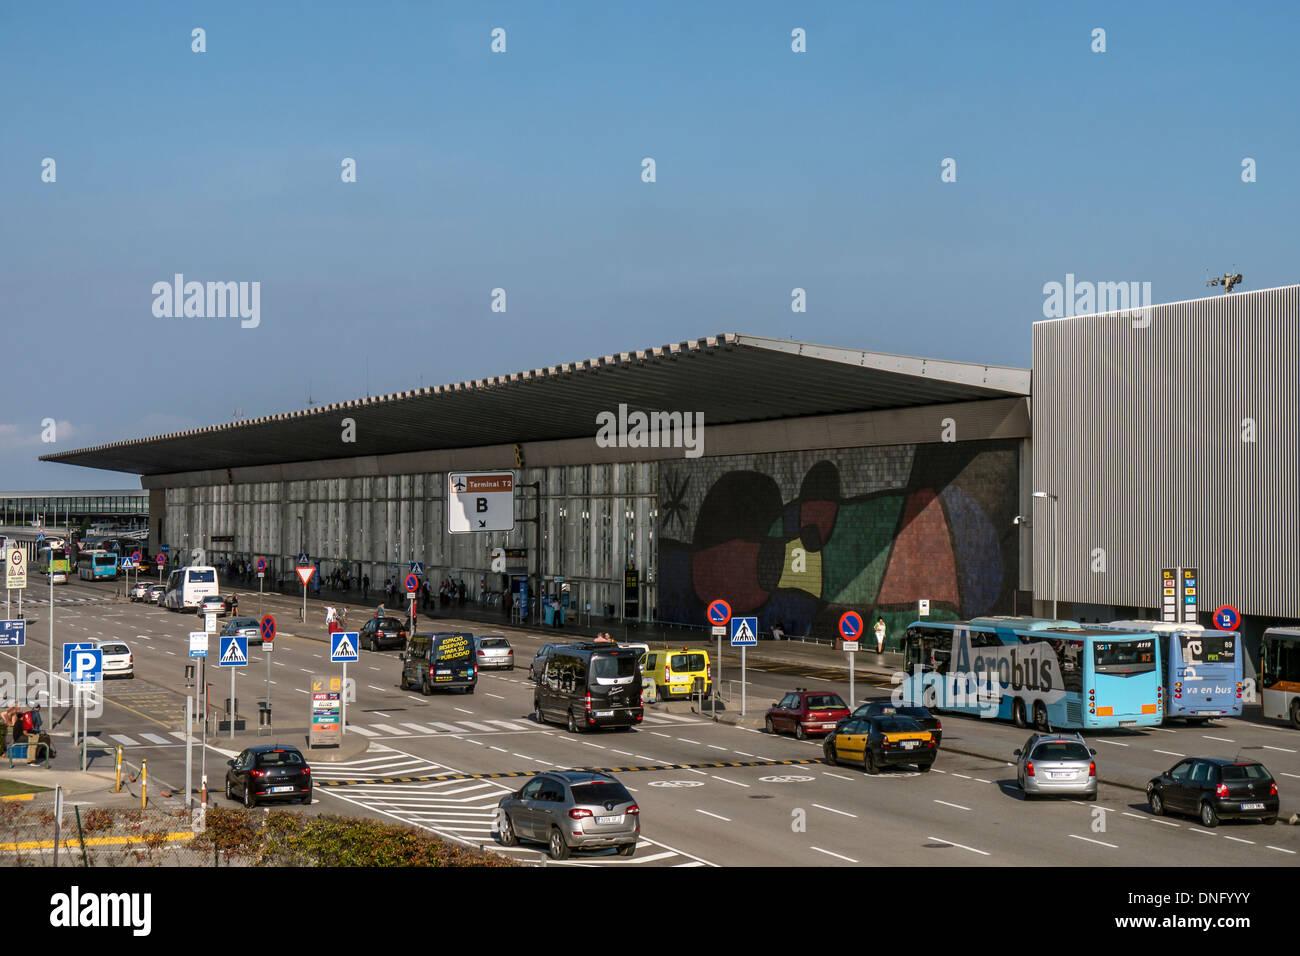 Terminal Building at Barcelona Airport - Stock Image